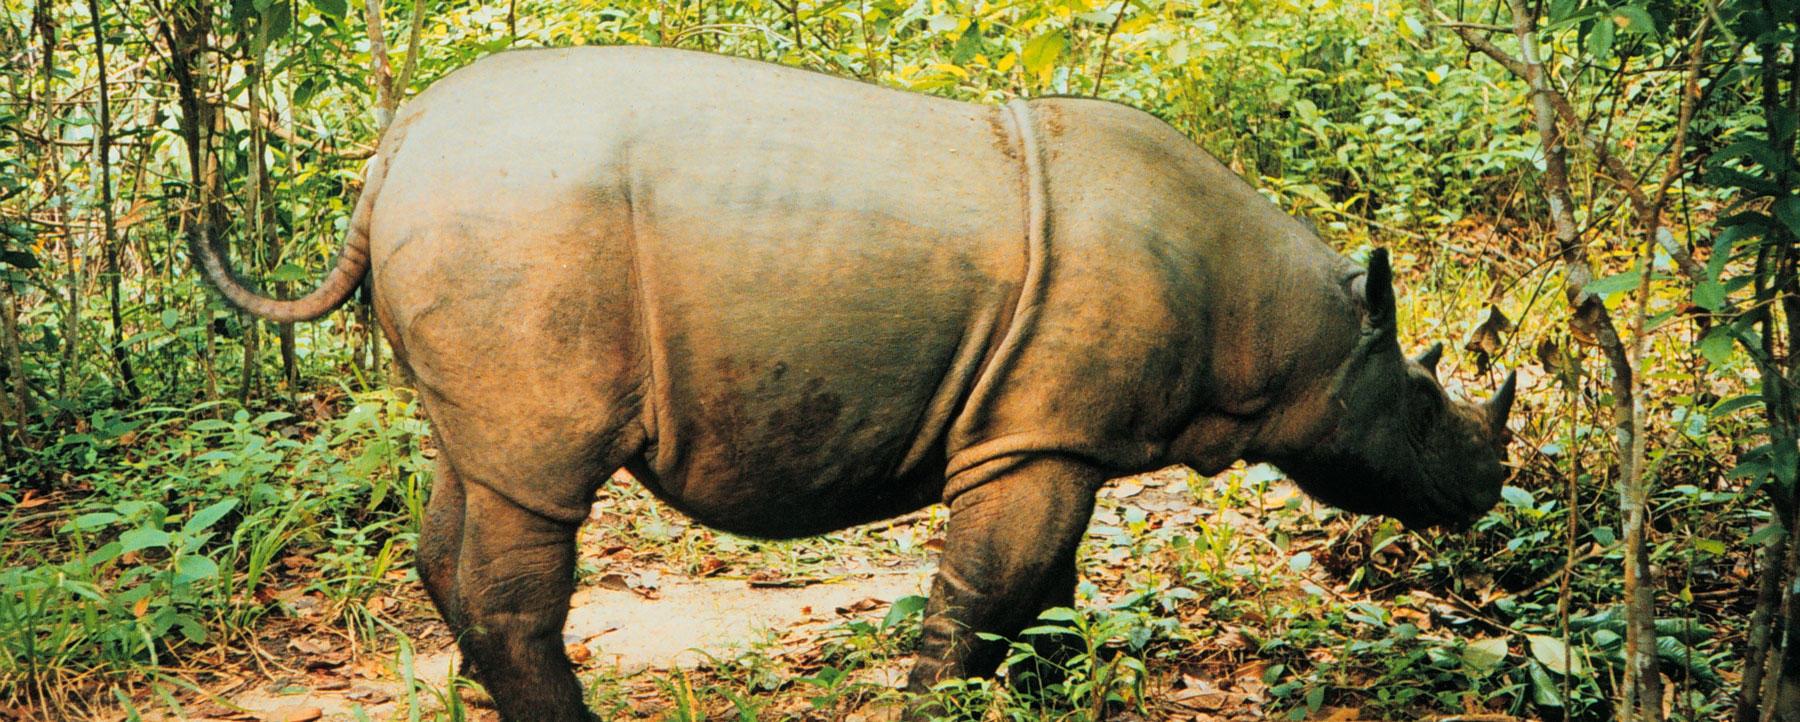 sumatran rhinos now extinct in malaysia